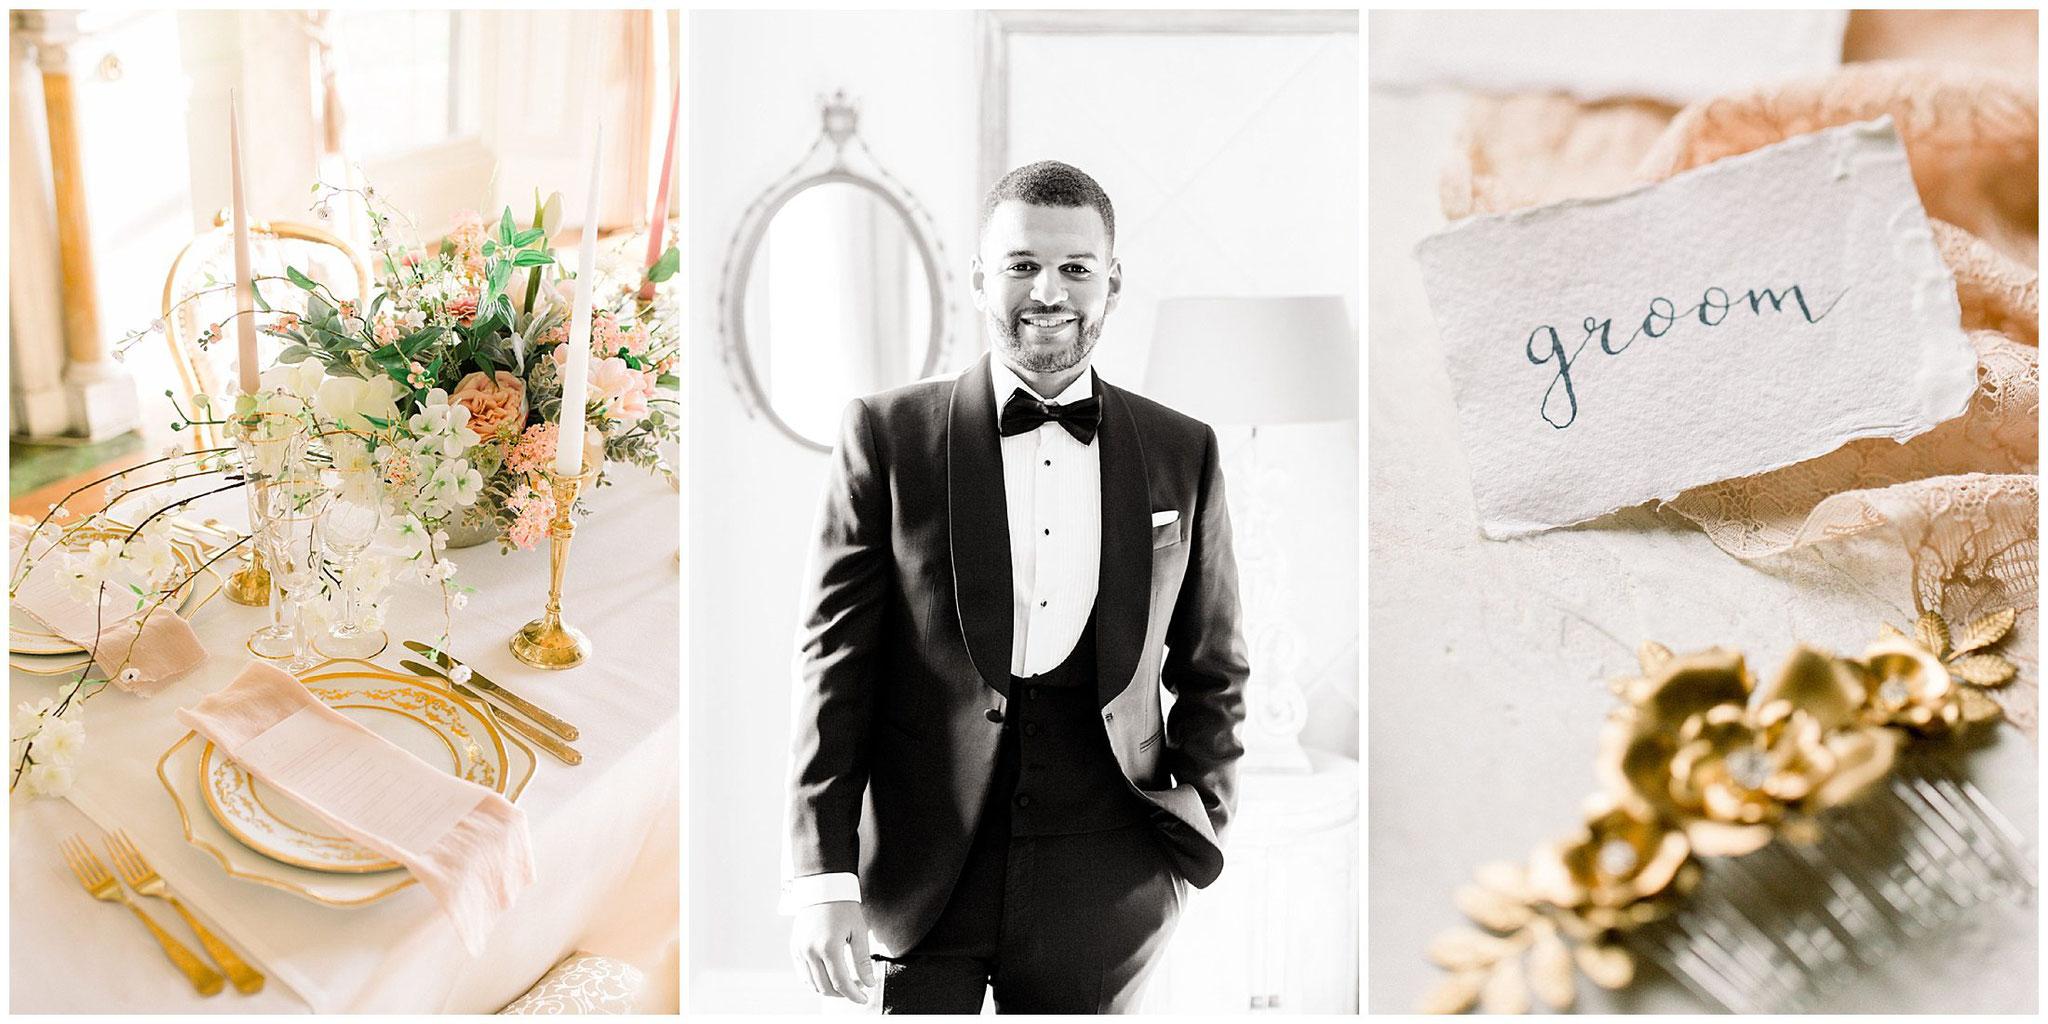 hochzeitsfotograf England jane weber wedding photographer uk leicester prestwoldhall groom